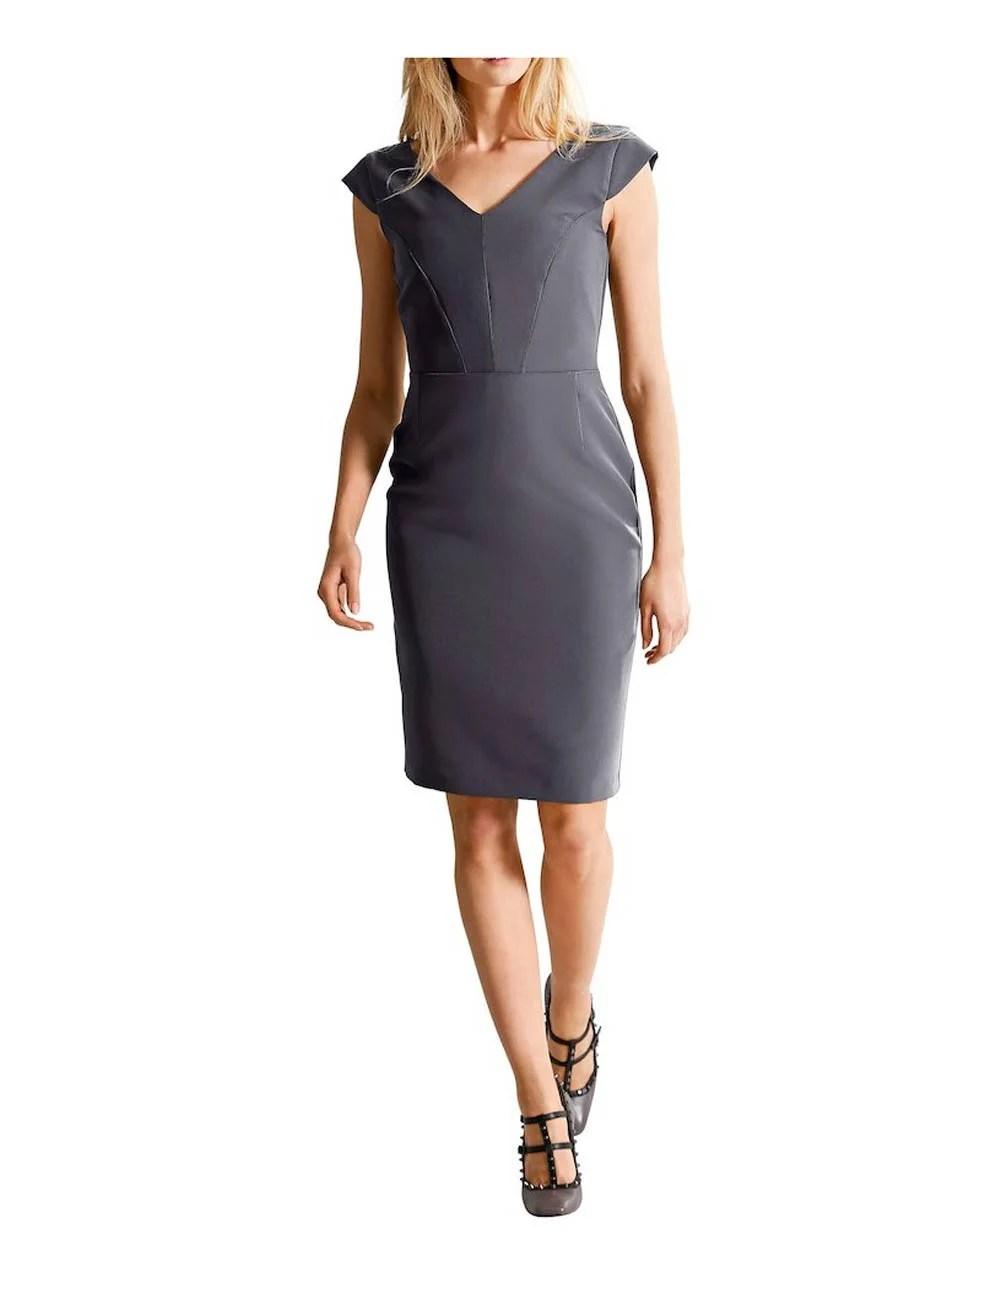 461.785 ALBA MODA Damen Designer-Etuikleid Grau